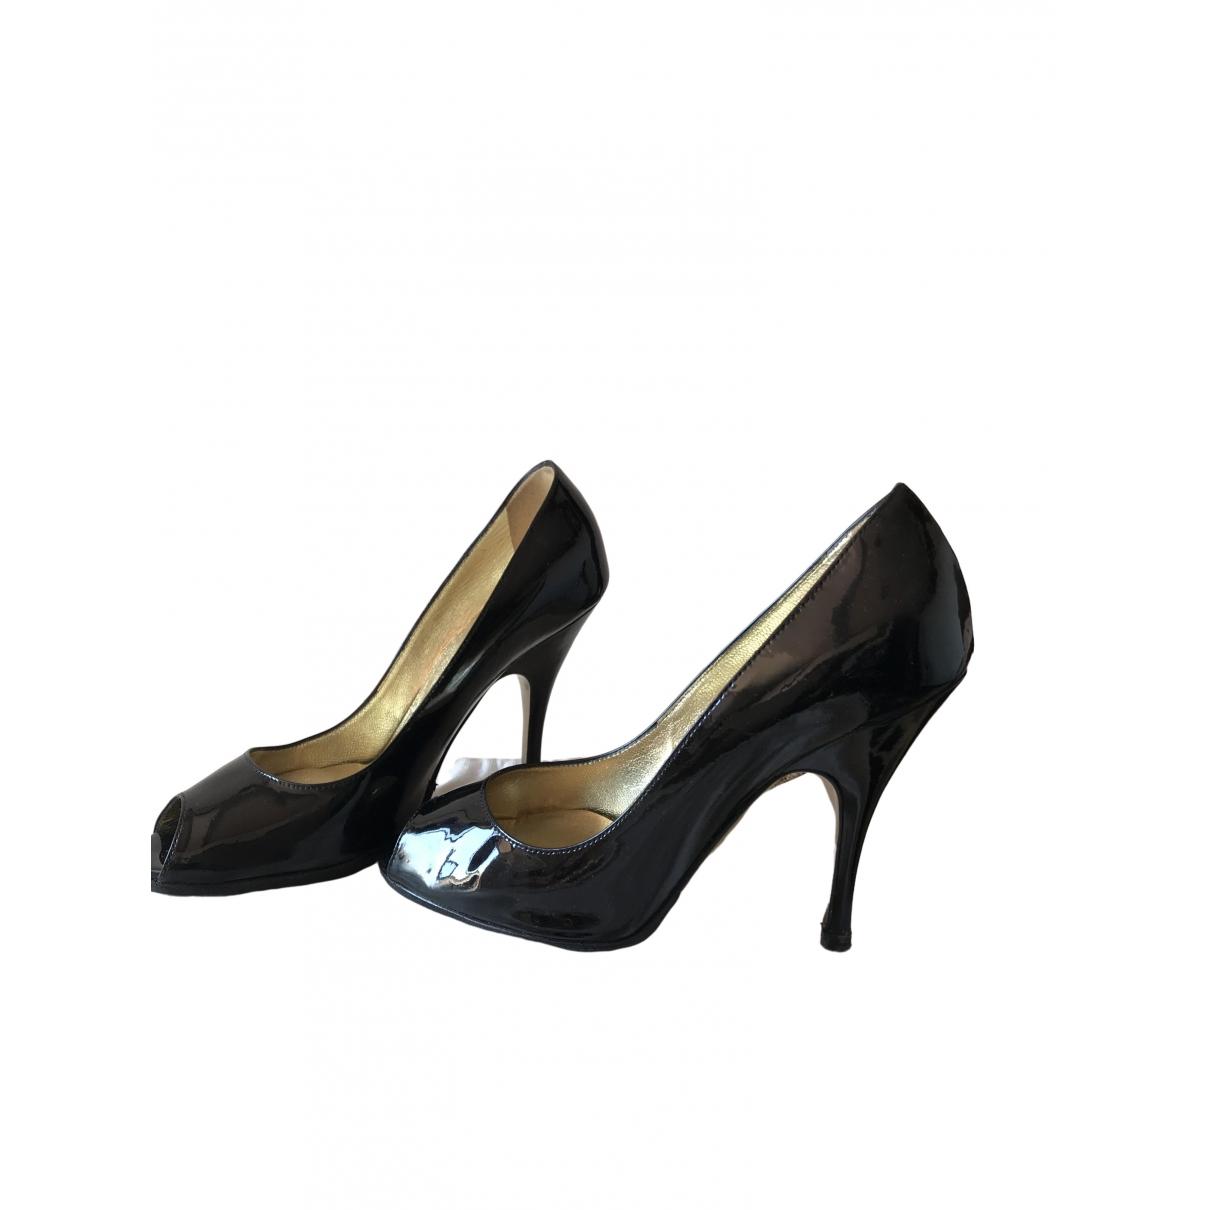 D&g \N Black Leather Heels for Women 37 EU